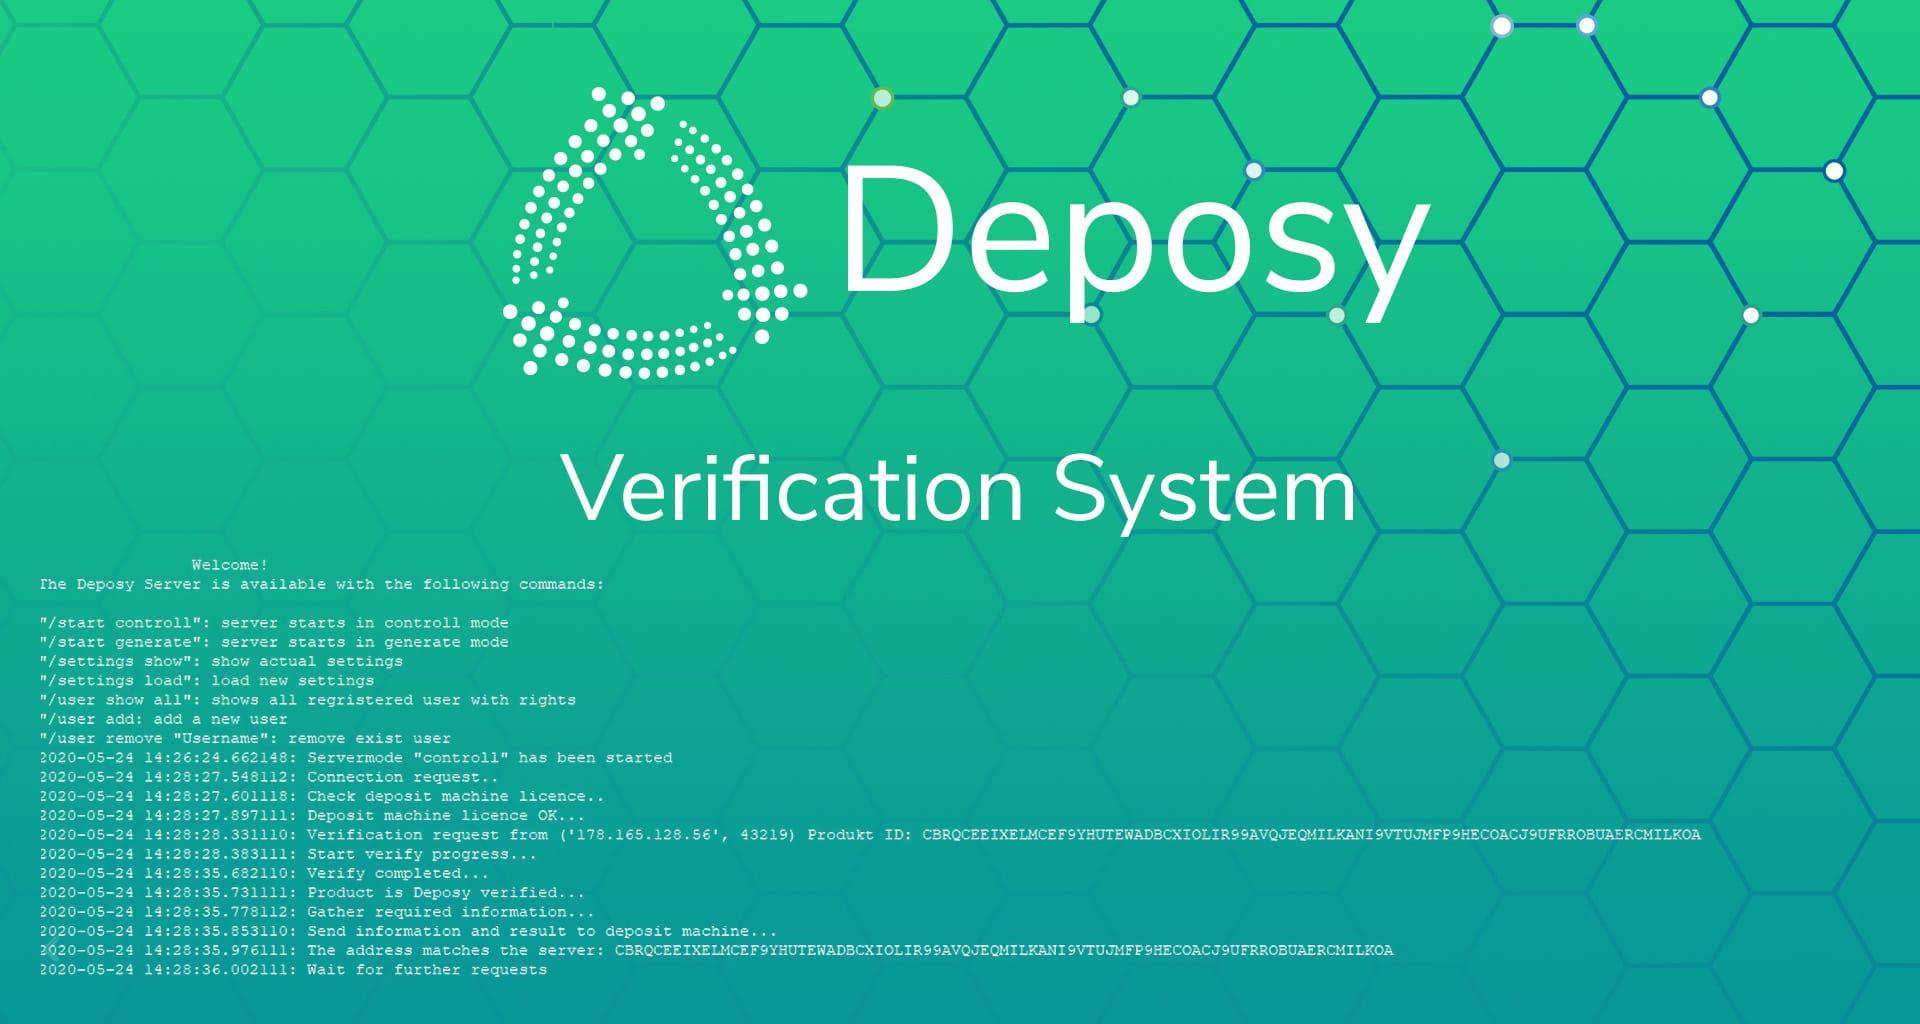 deposy verification system